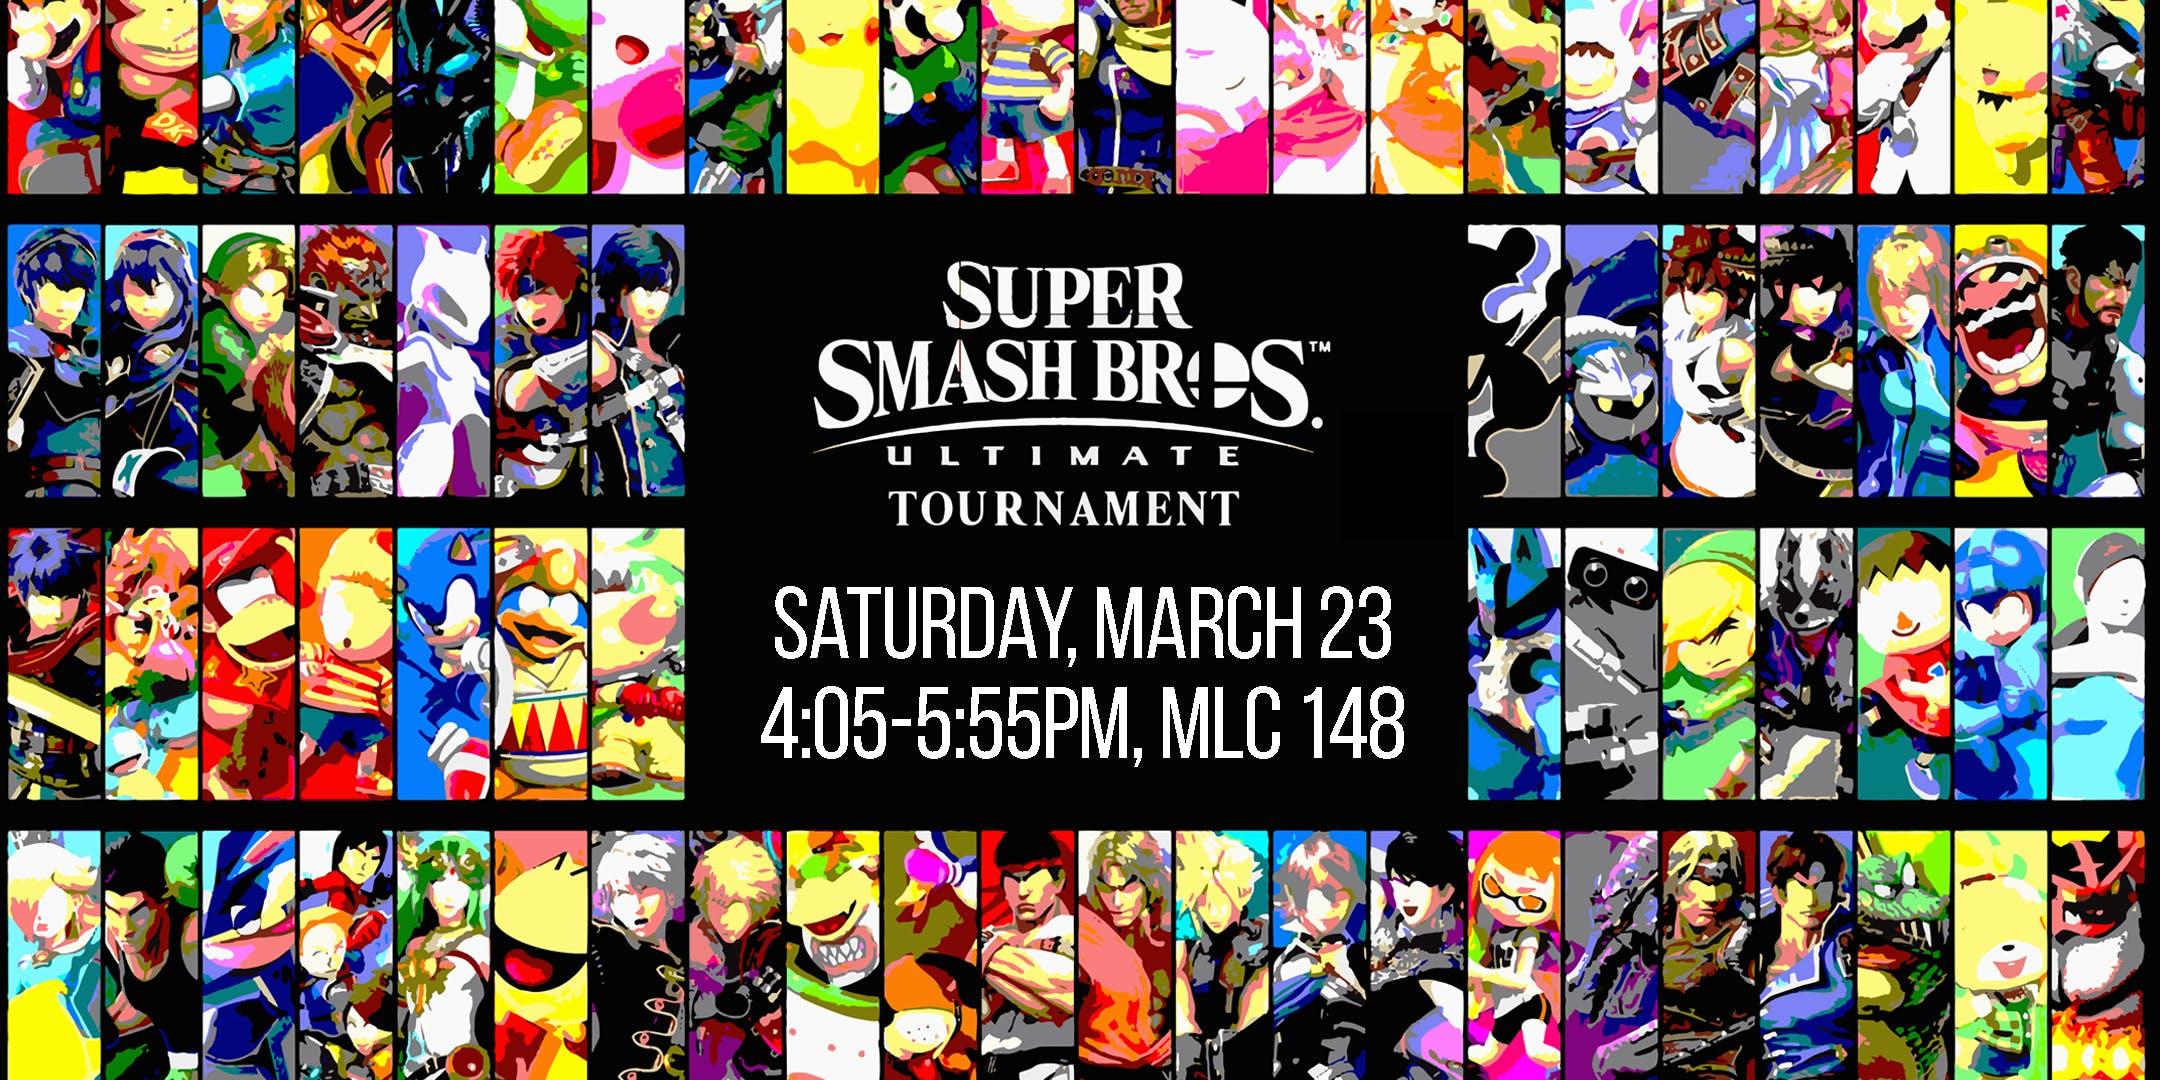 Super Smash Brothers Ultimate Break @ MIST